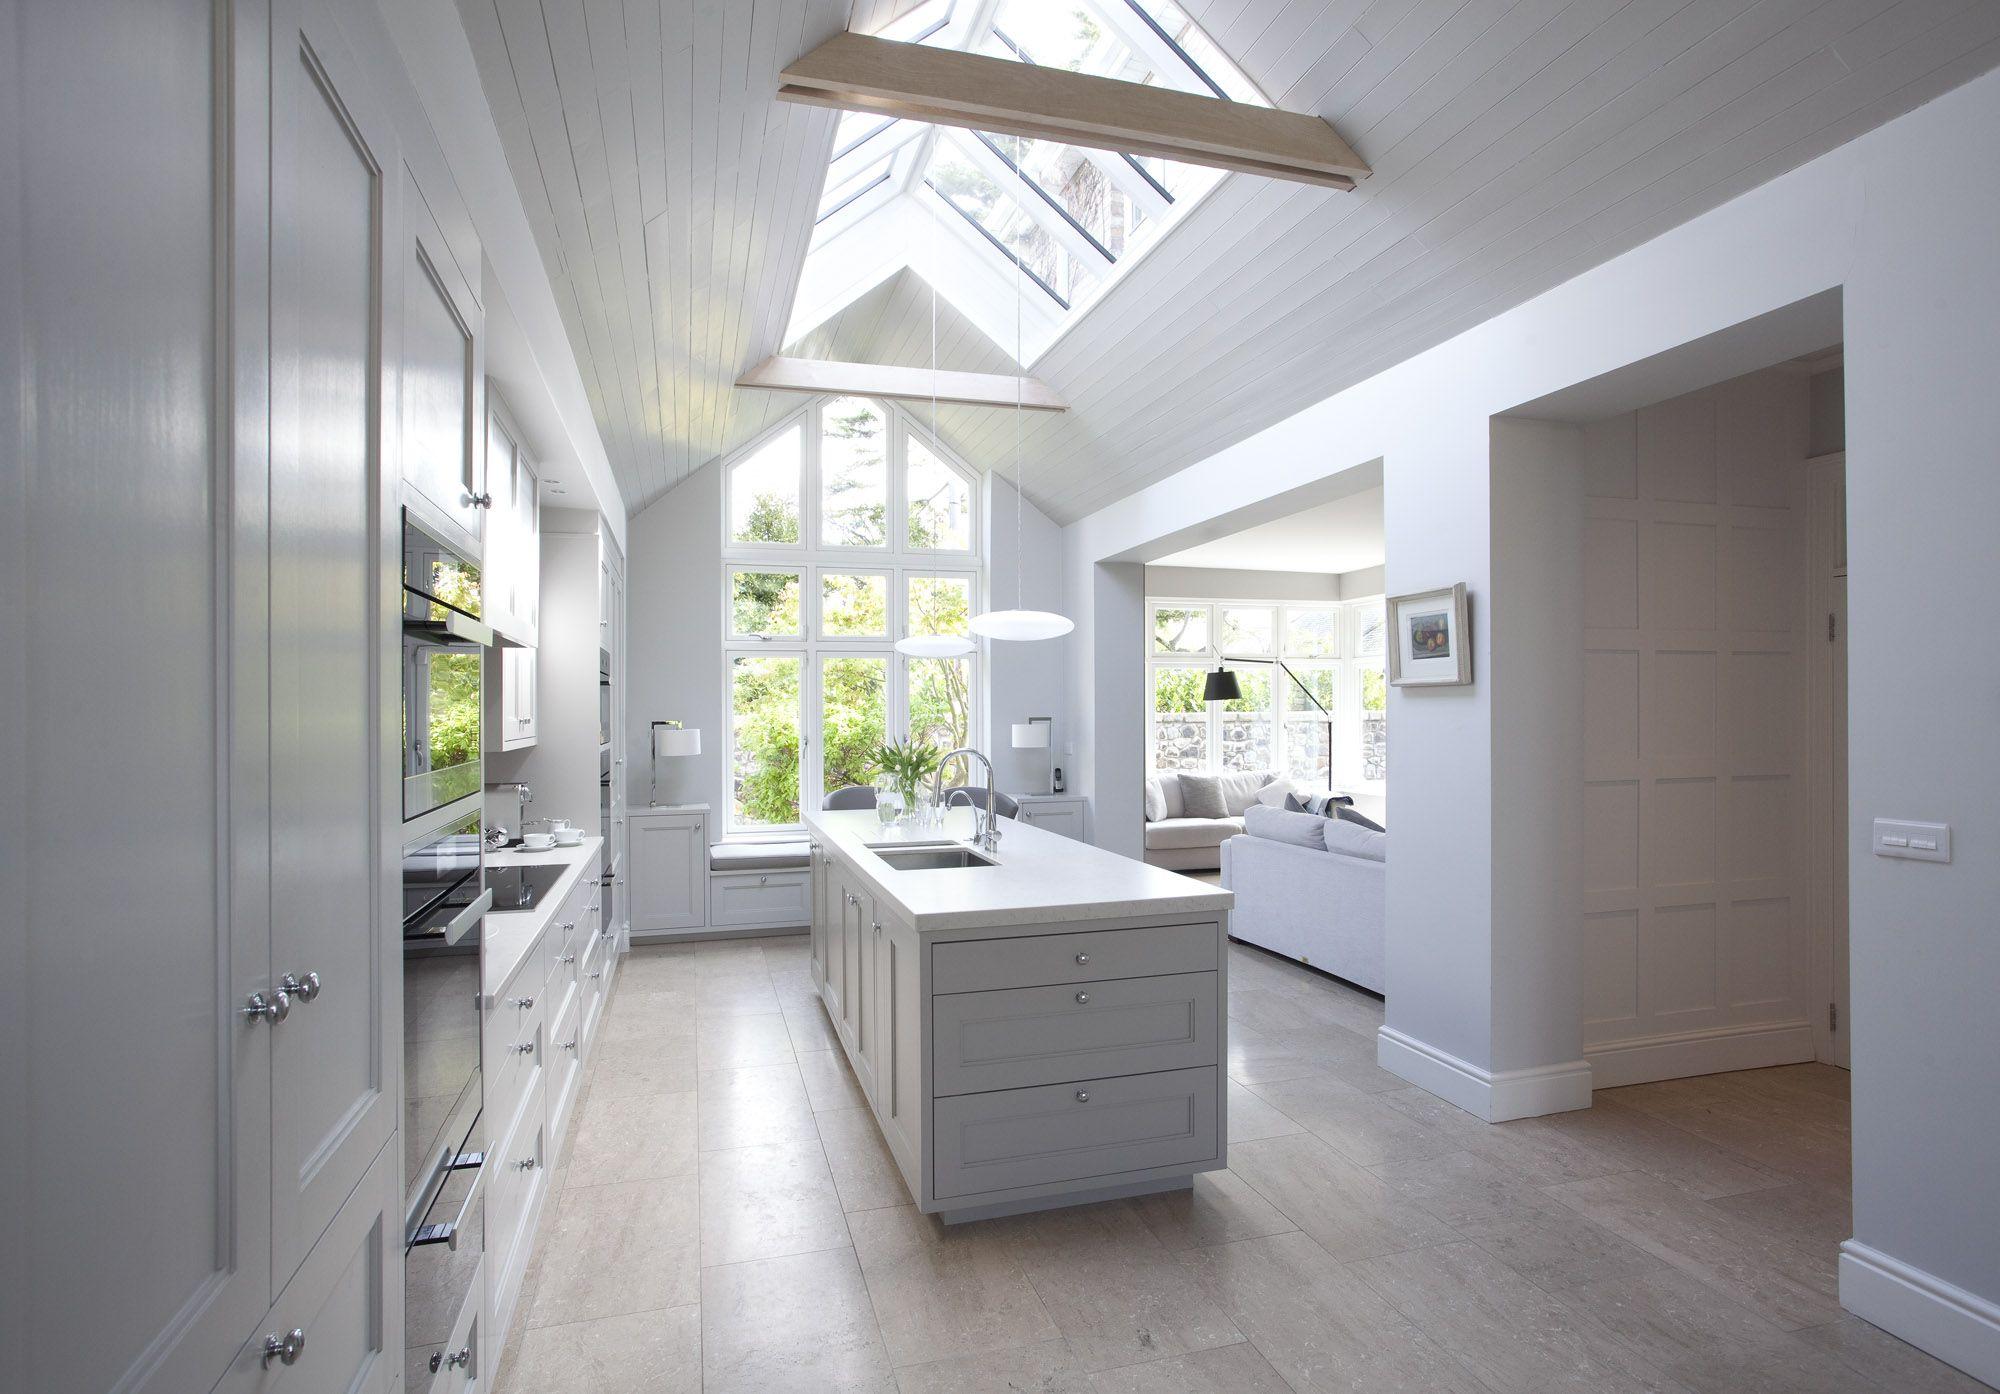 Mews Conversion Kitchen conversion, Classical interior